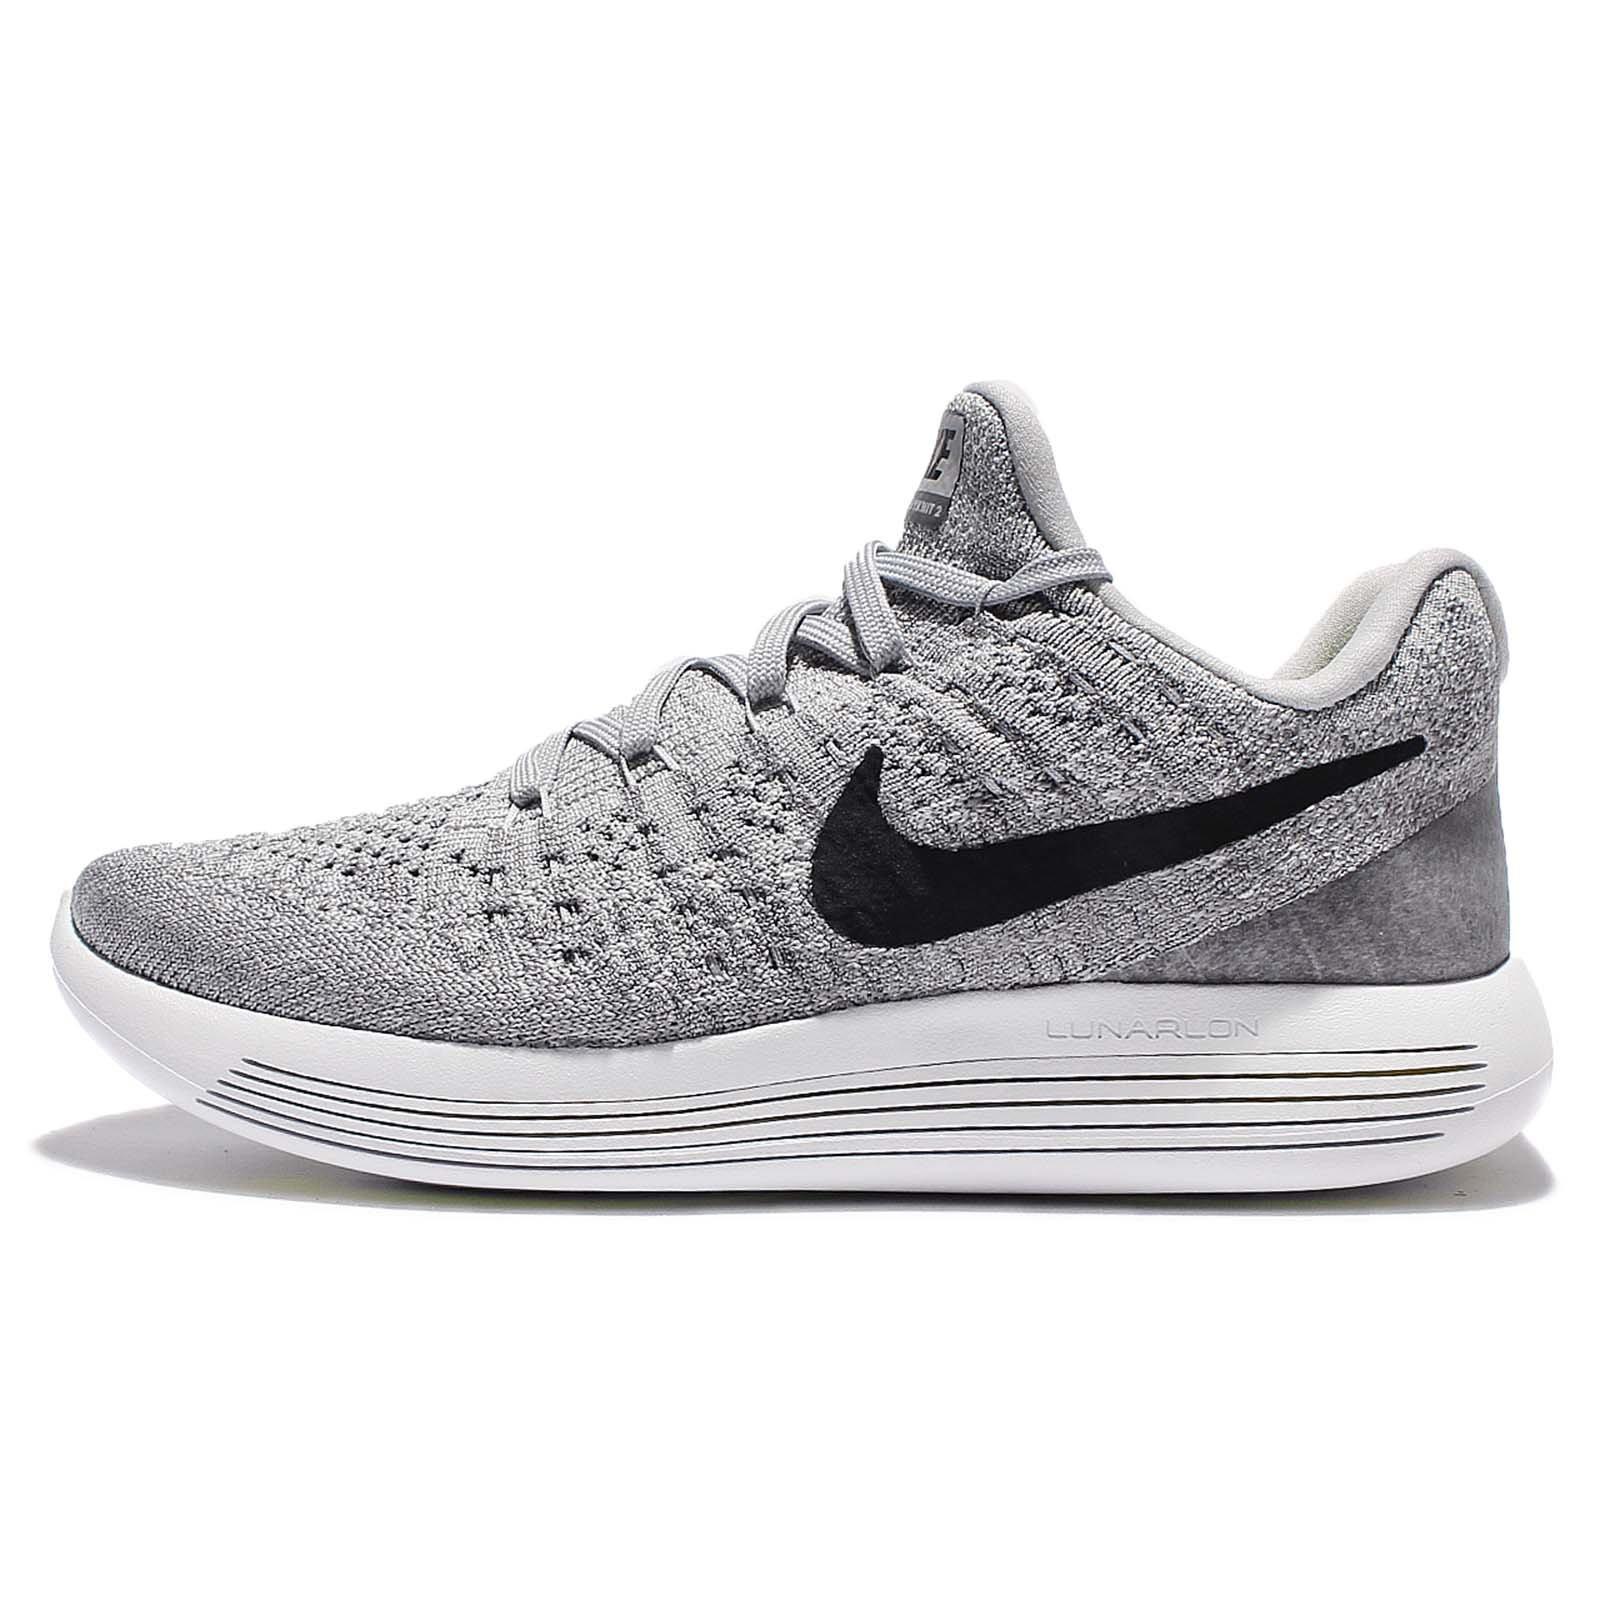 Nike Women Lunarepic Low Flyknit 2 Running (wolf grey / black-cool grey-pure platinum) Size 5.0 US